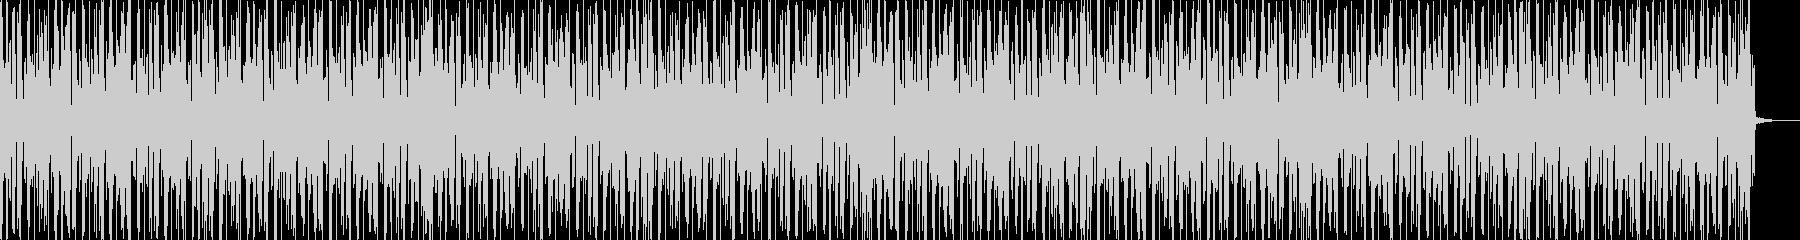 YouTubeヒップホップ・日常・楽しいの未再生の波形